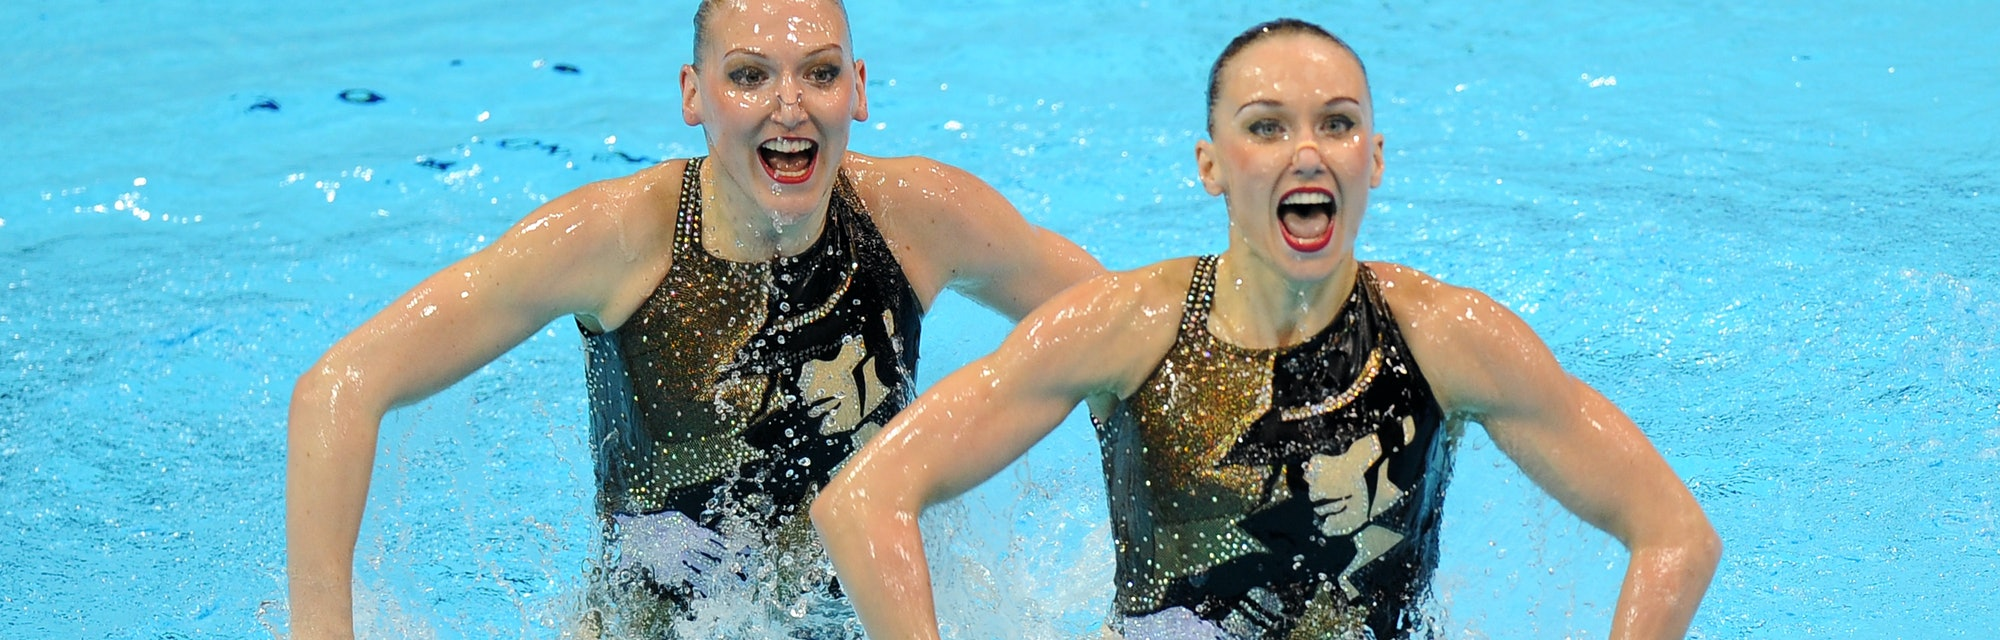 Russia's Natalia Ischenko and Svetlana Romashina in action in the Duets Technical Routine   (Photo b...